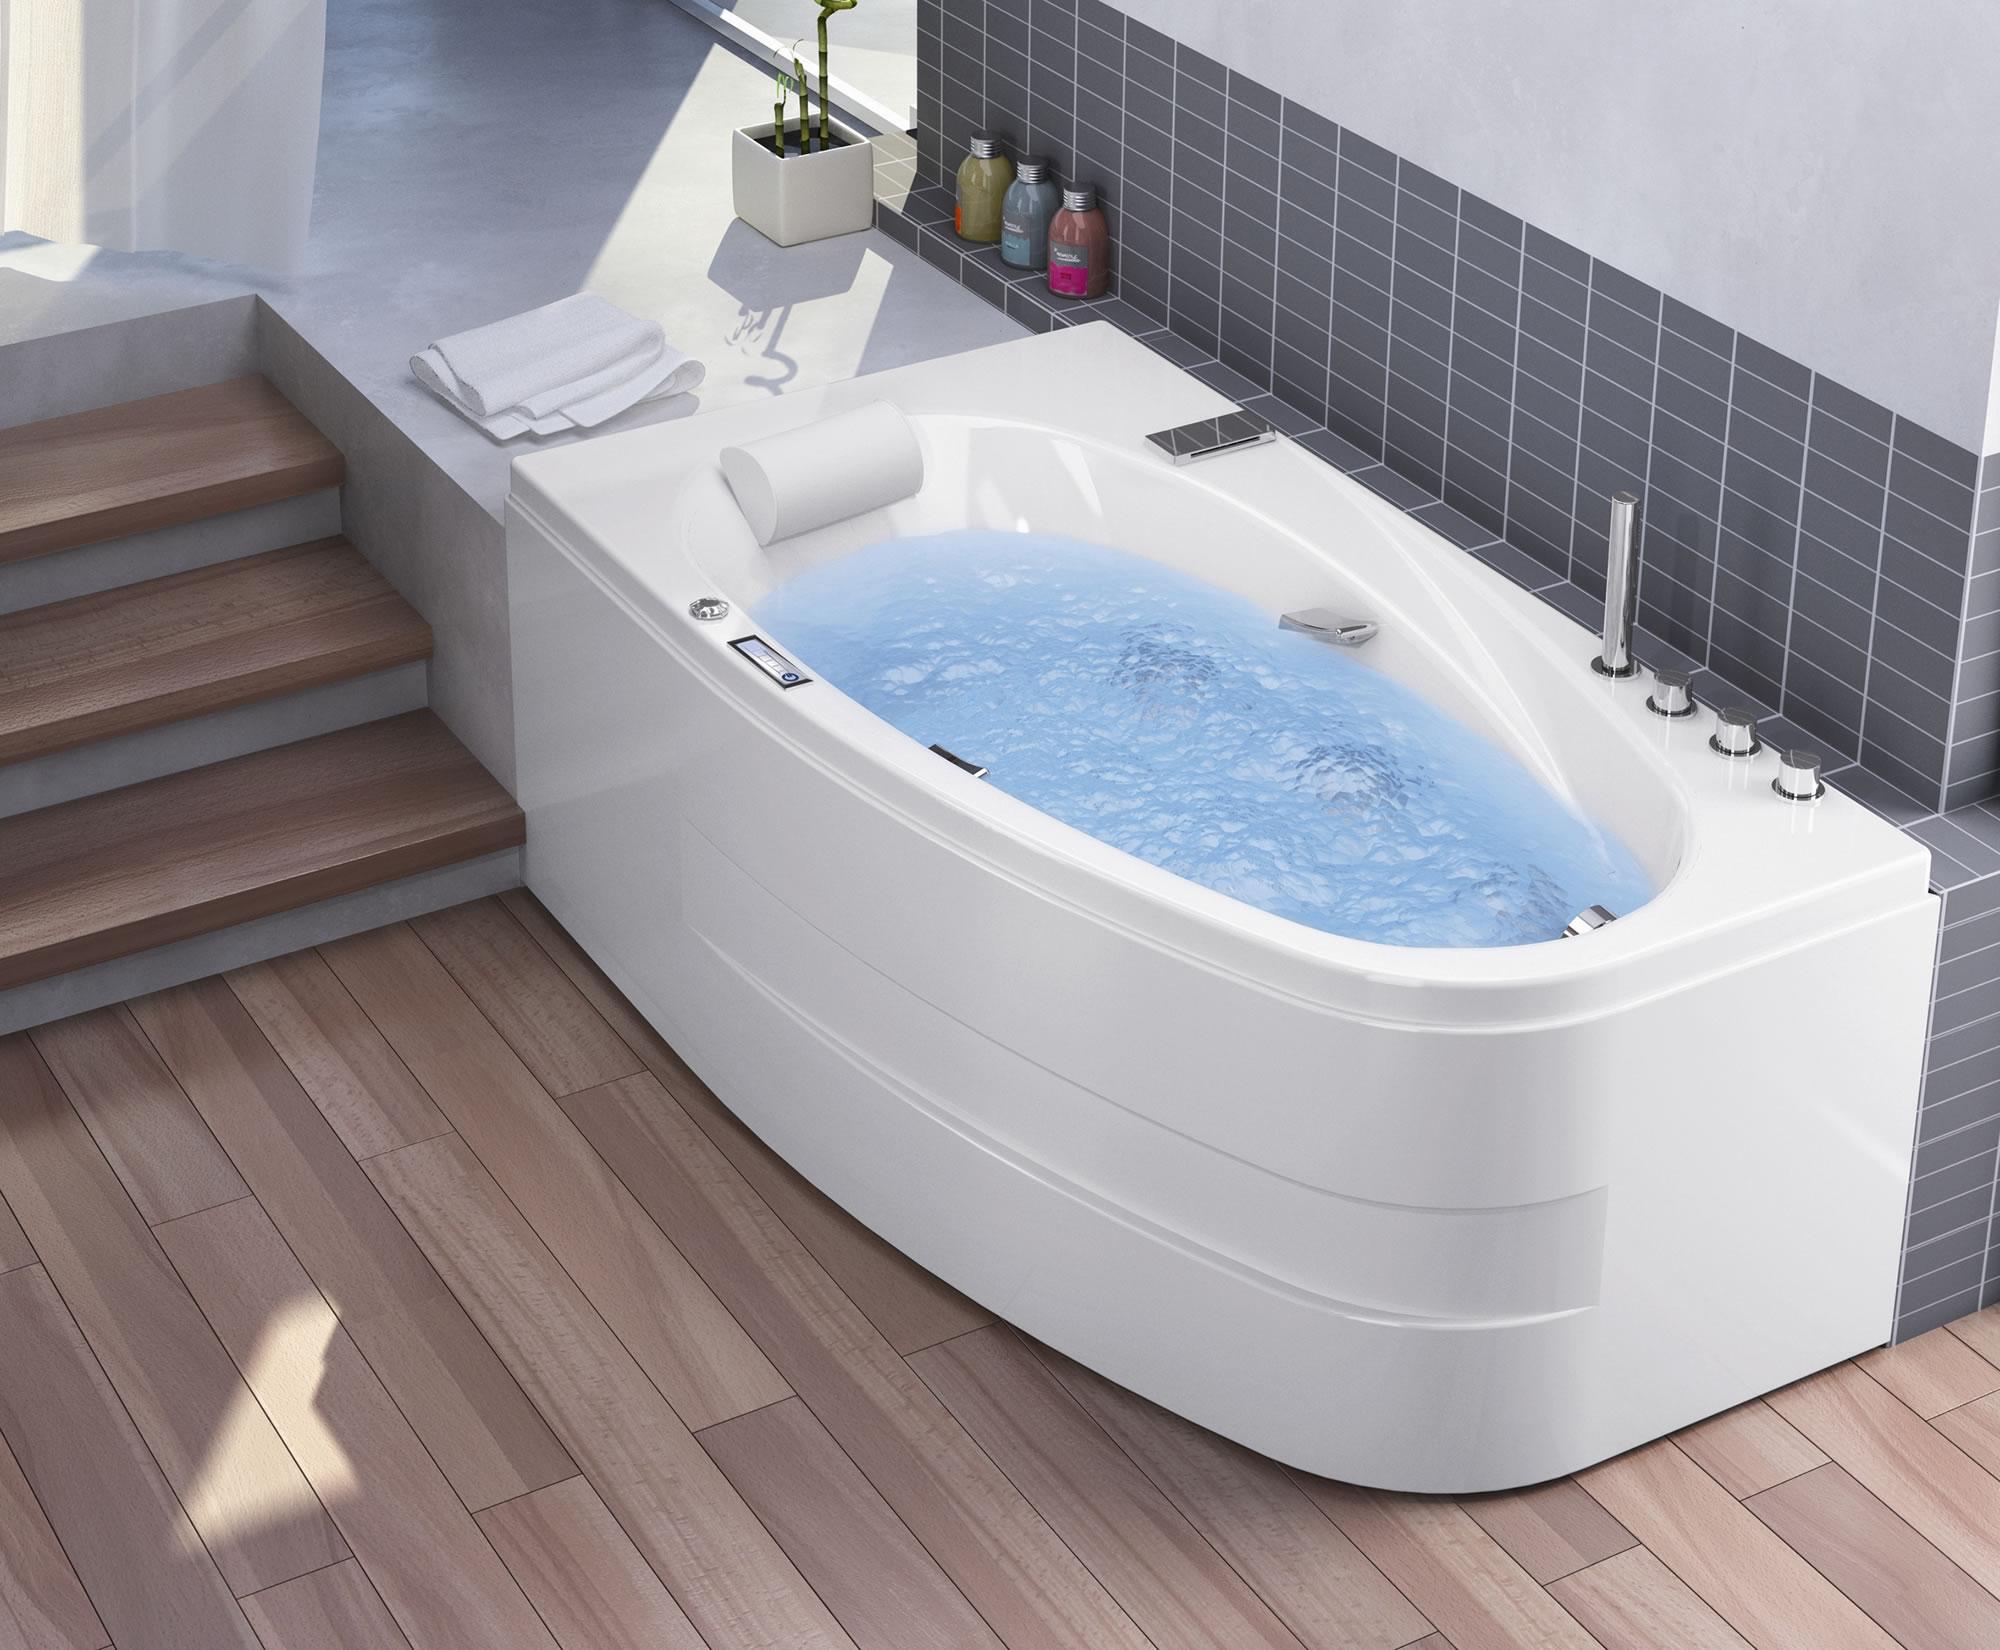 Vasca Da Bagno Grandform : Grandform tri service assistenza e manutenzione caldaie versilia